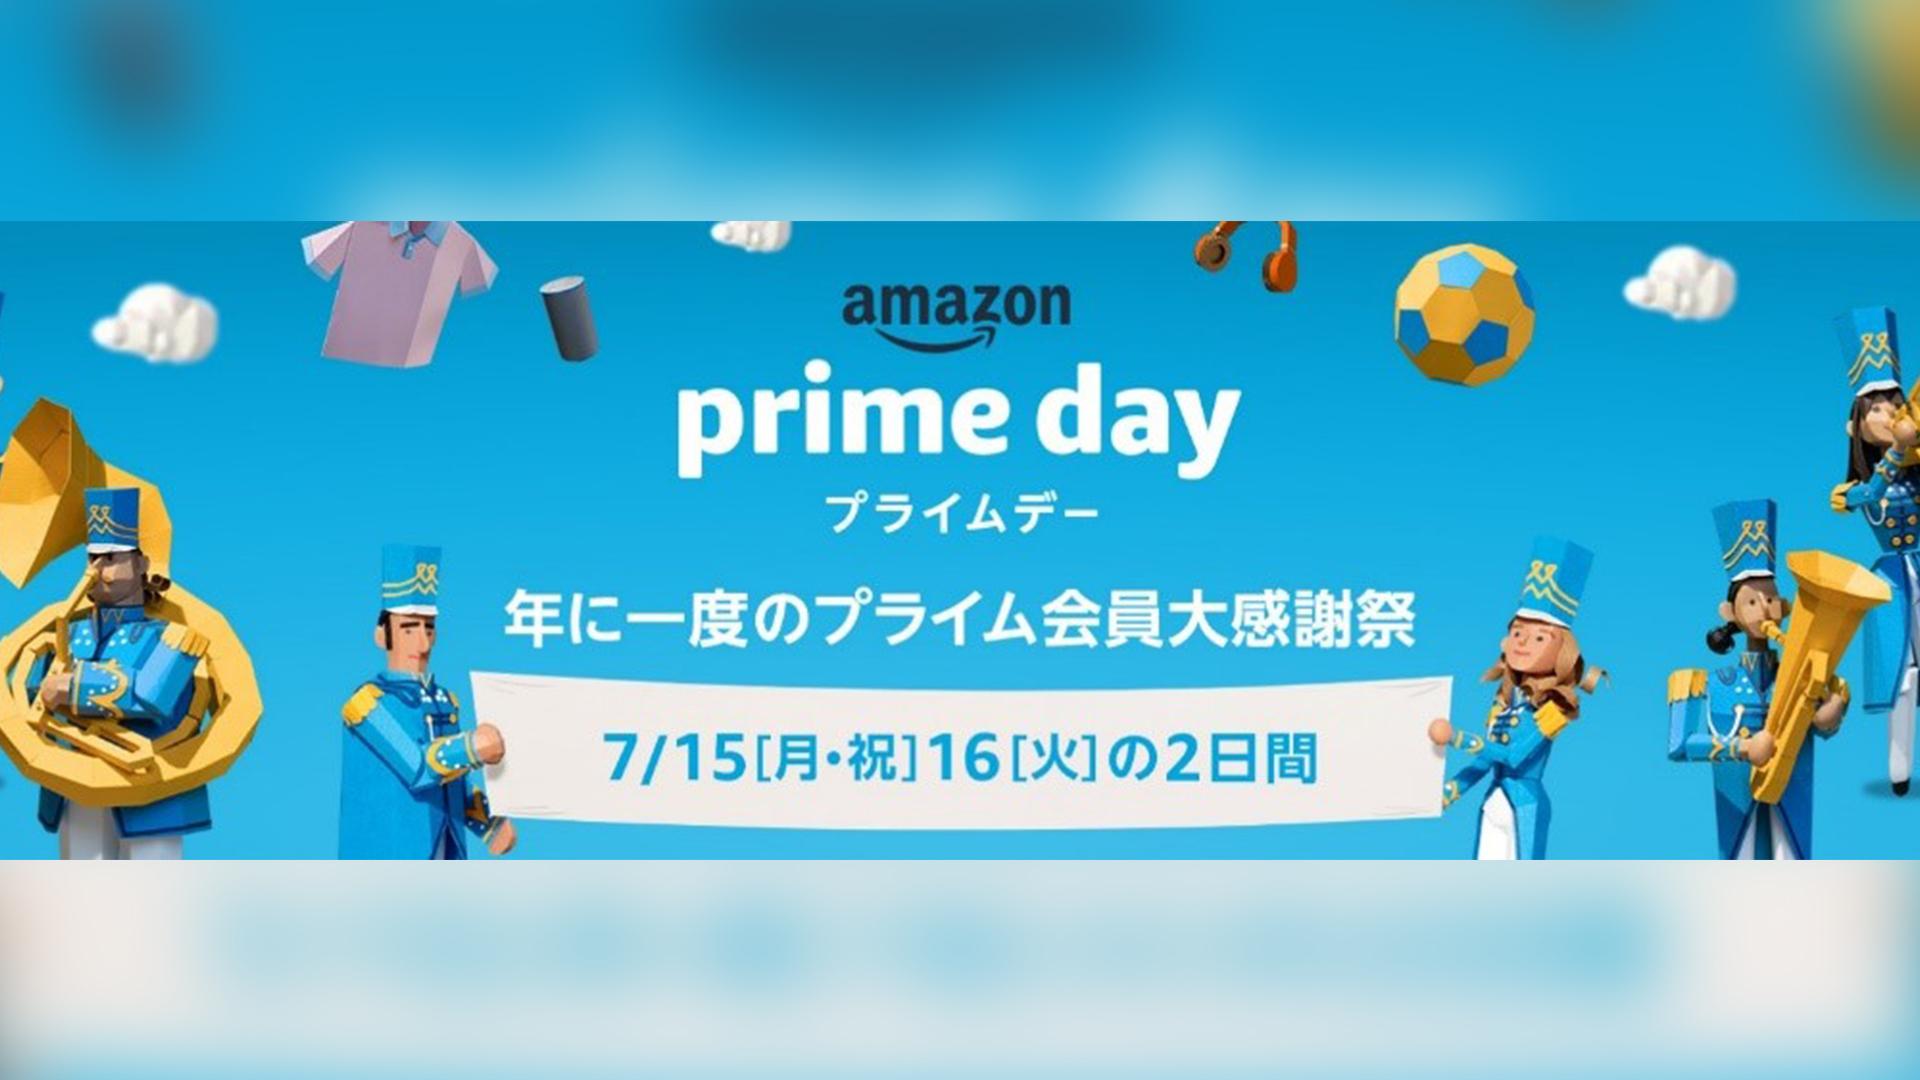 【Amazonの「プライムデー」過去最長の48時間開催】他、新着トレンド6月26日